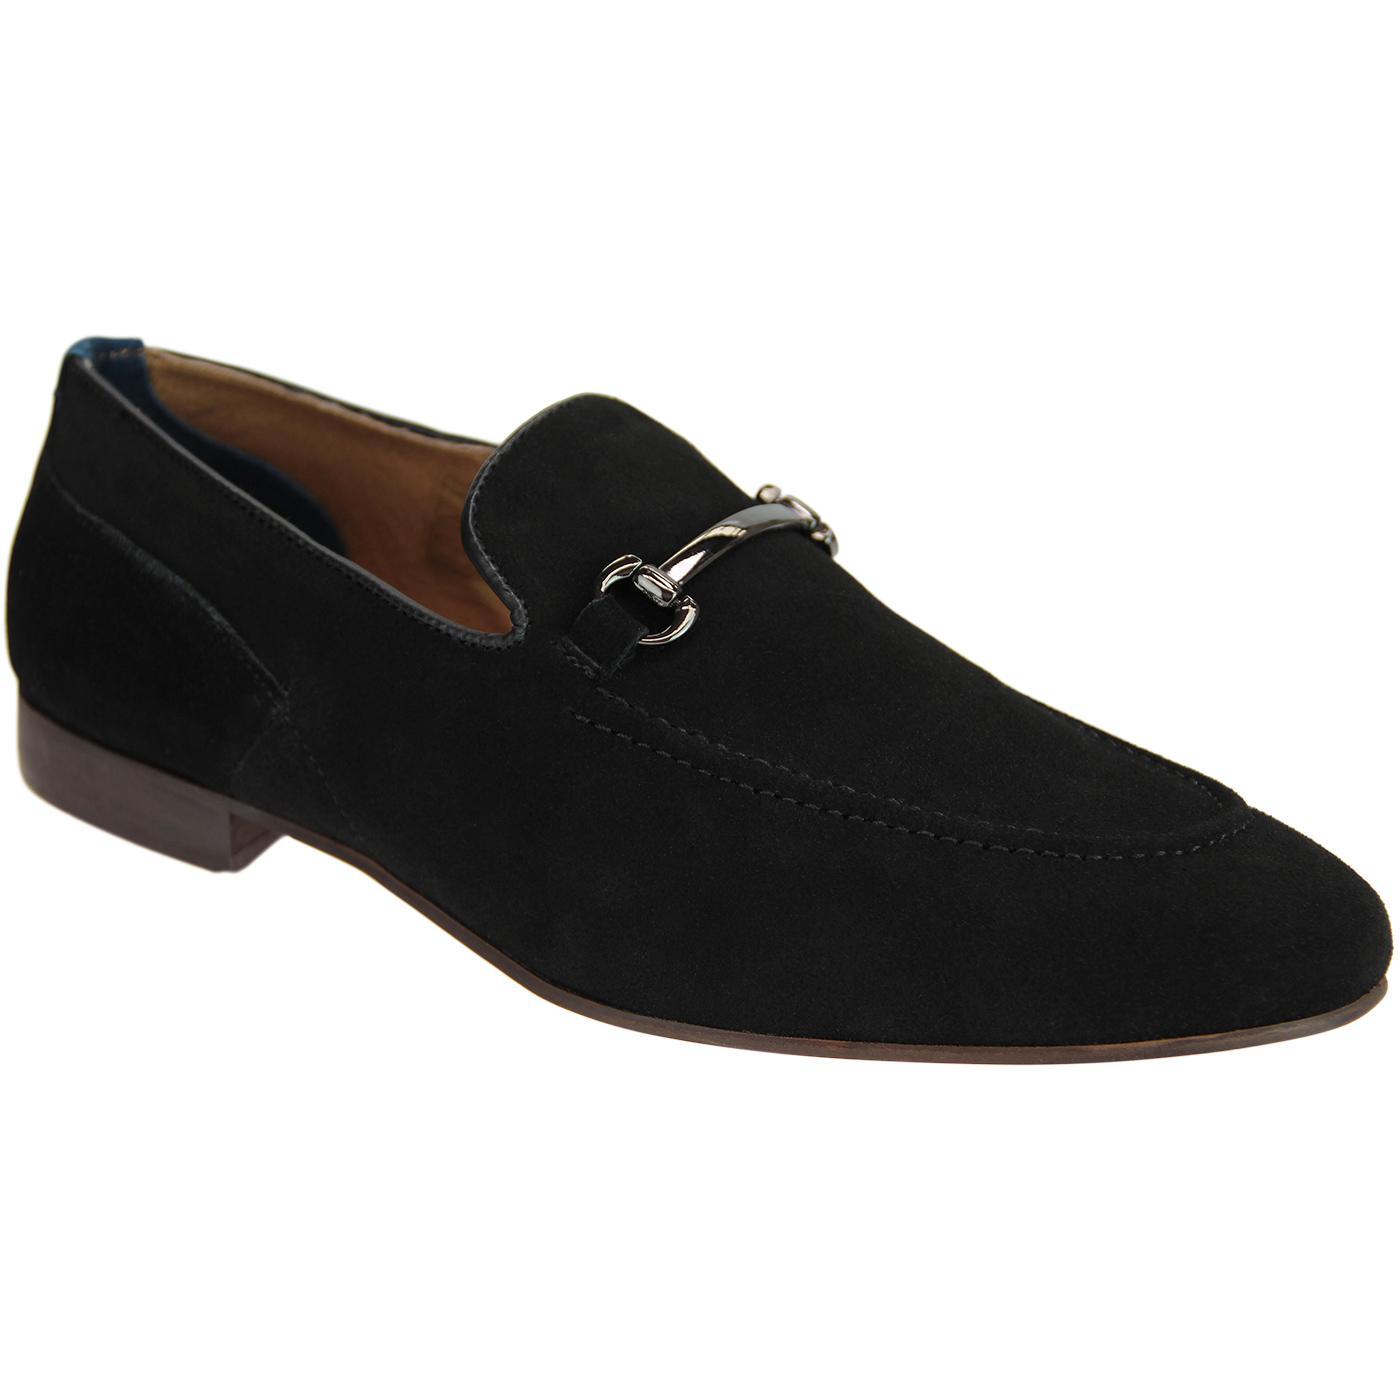 Banchory HUDSON Men's Retro Suede Loafers BLACK